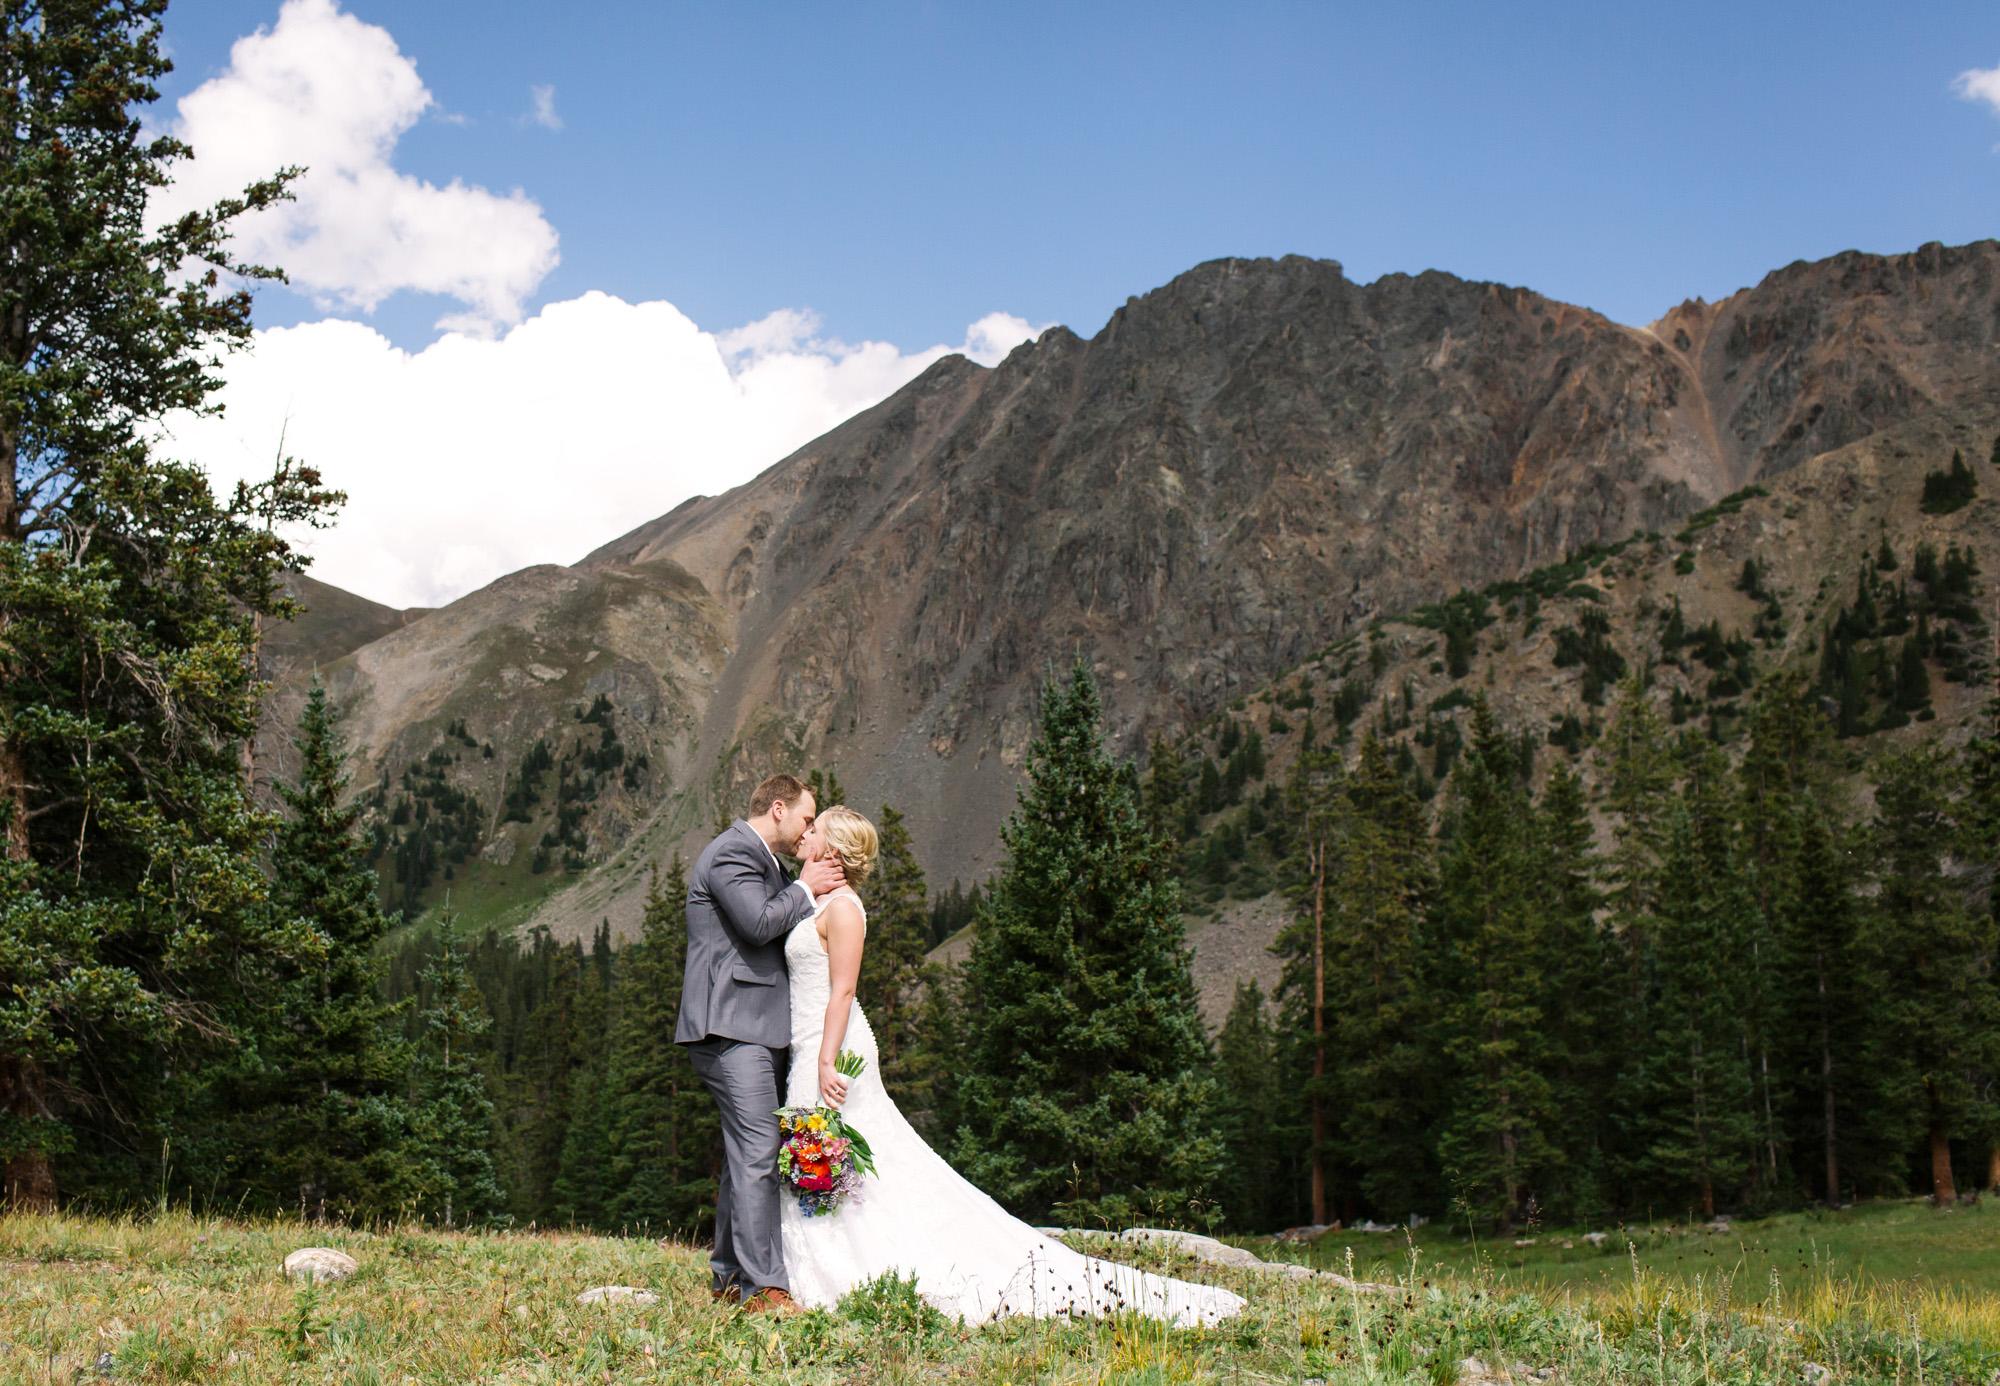 19_Brittany_Darin_Arapahoe_Basin_Wedding_Keystone_CO_Tanya_Salazar_Photography_262.jpg